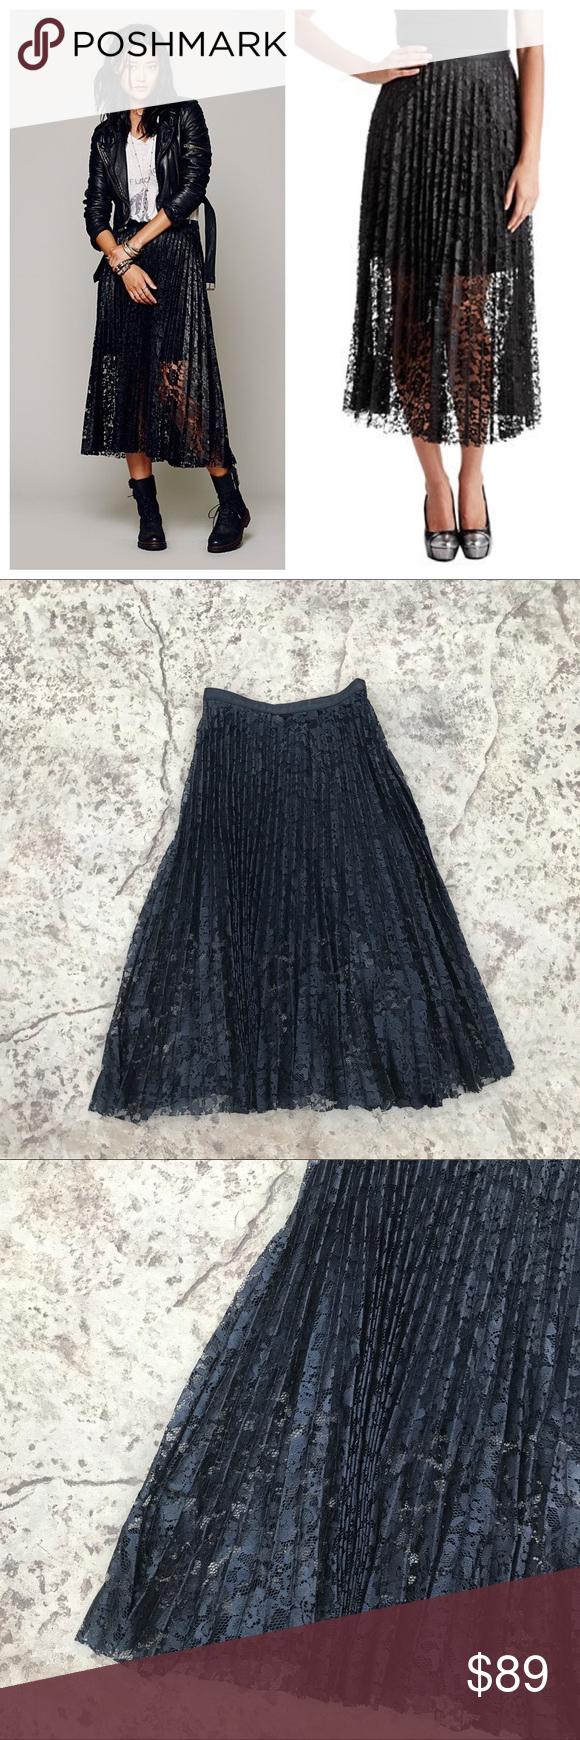 0cbe571133 Free People Lace Midi Pleated Skirt Black Lace midi Length shell with mini  length black lining